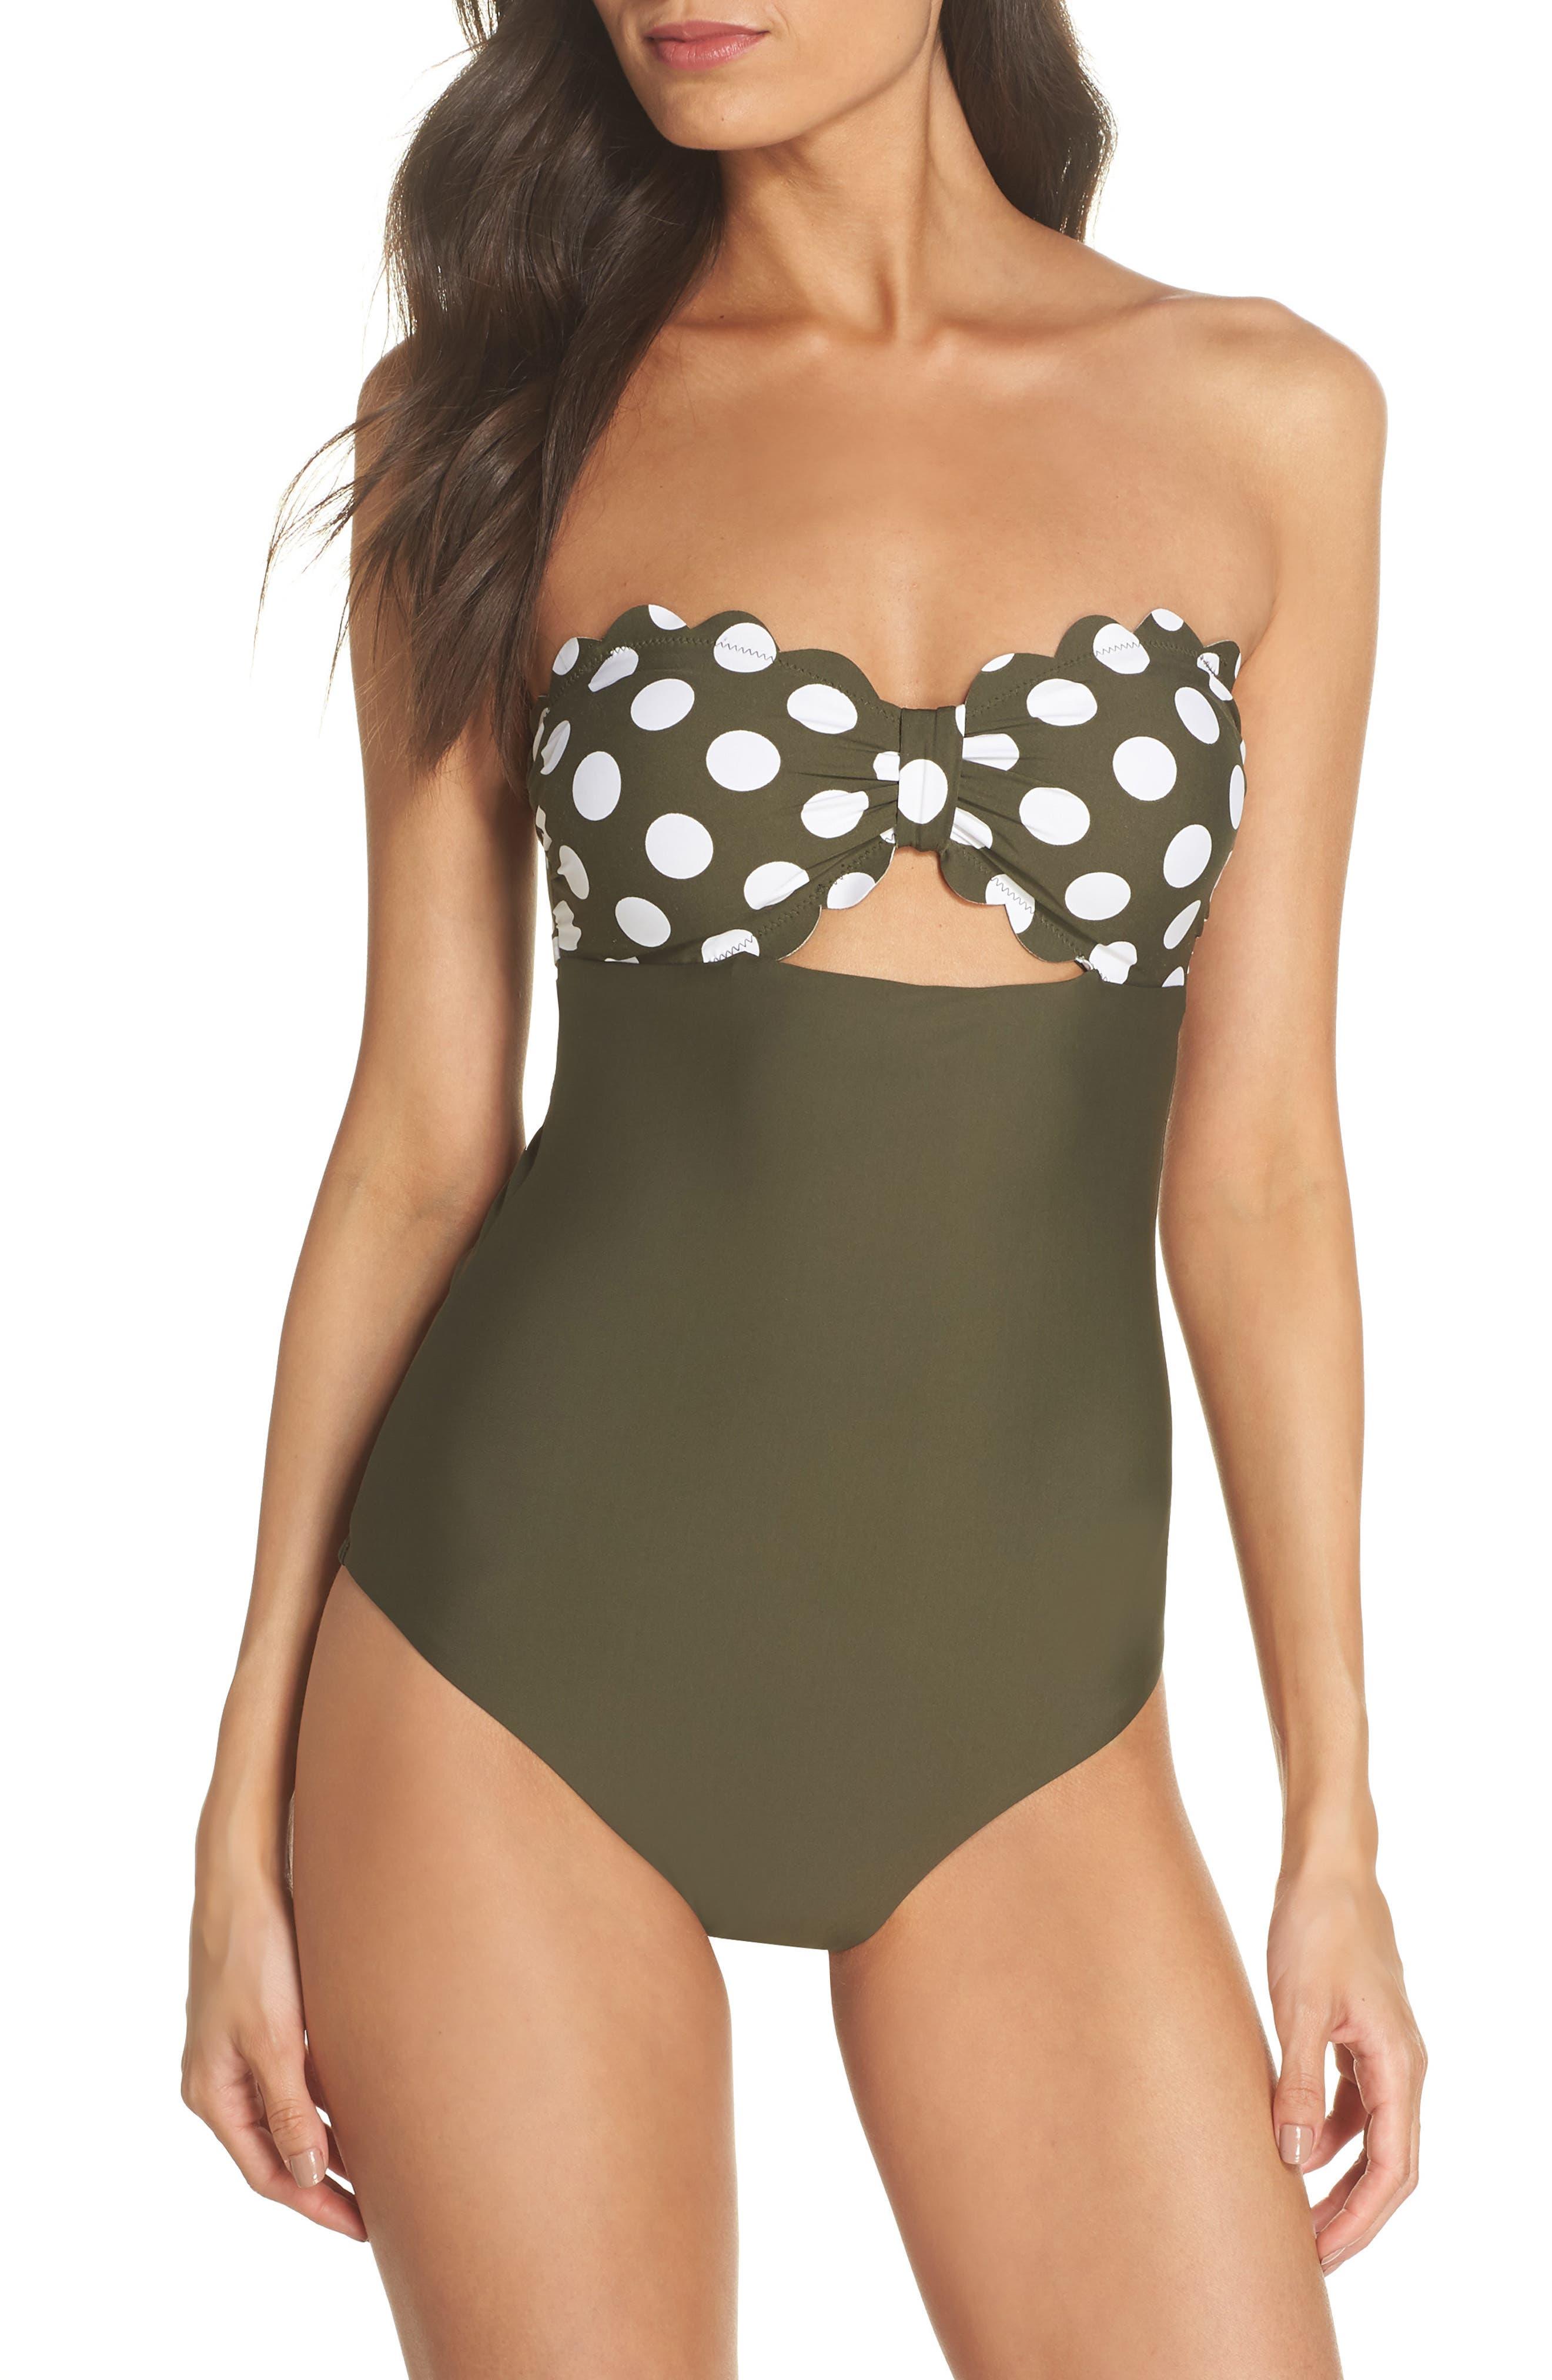 Scallop Bandeau One-Piece Swimsuit,                             Main thumbnail 1, color,                             OLIVE SARMA/ IVORY EGRET DOT